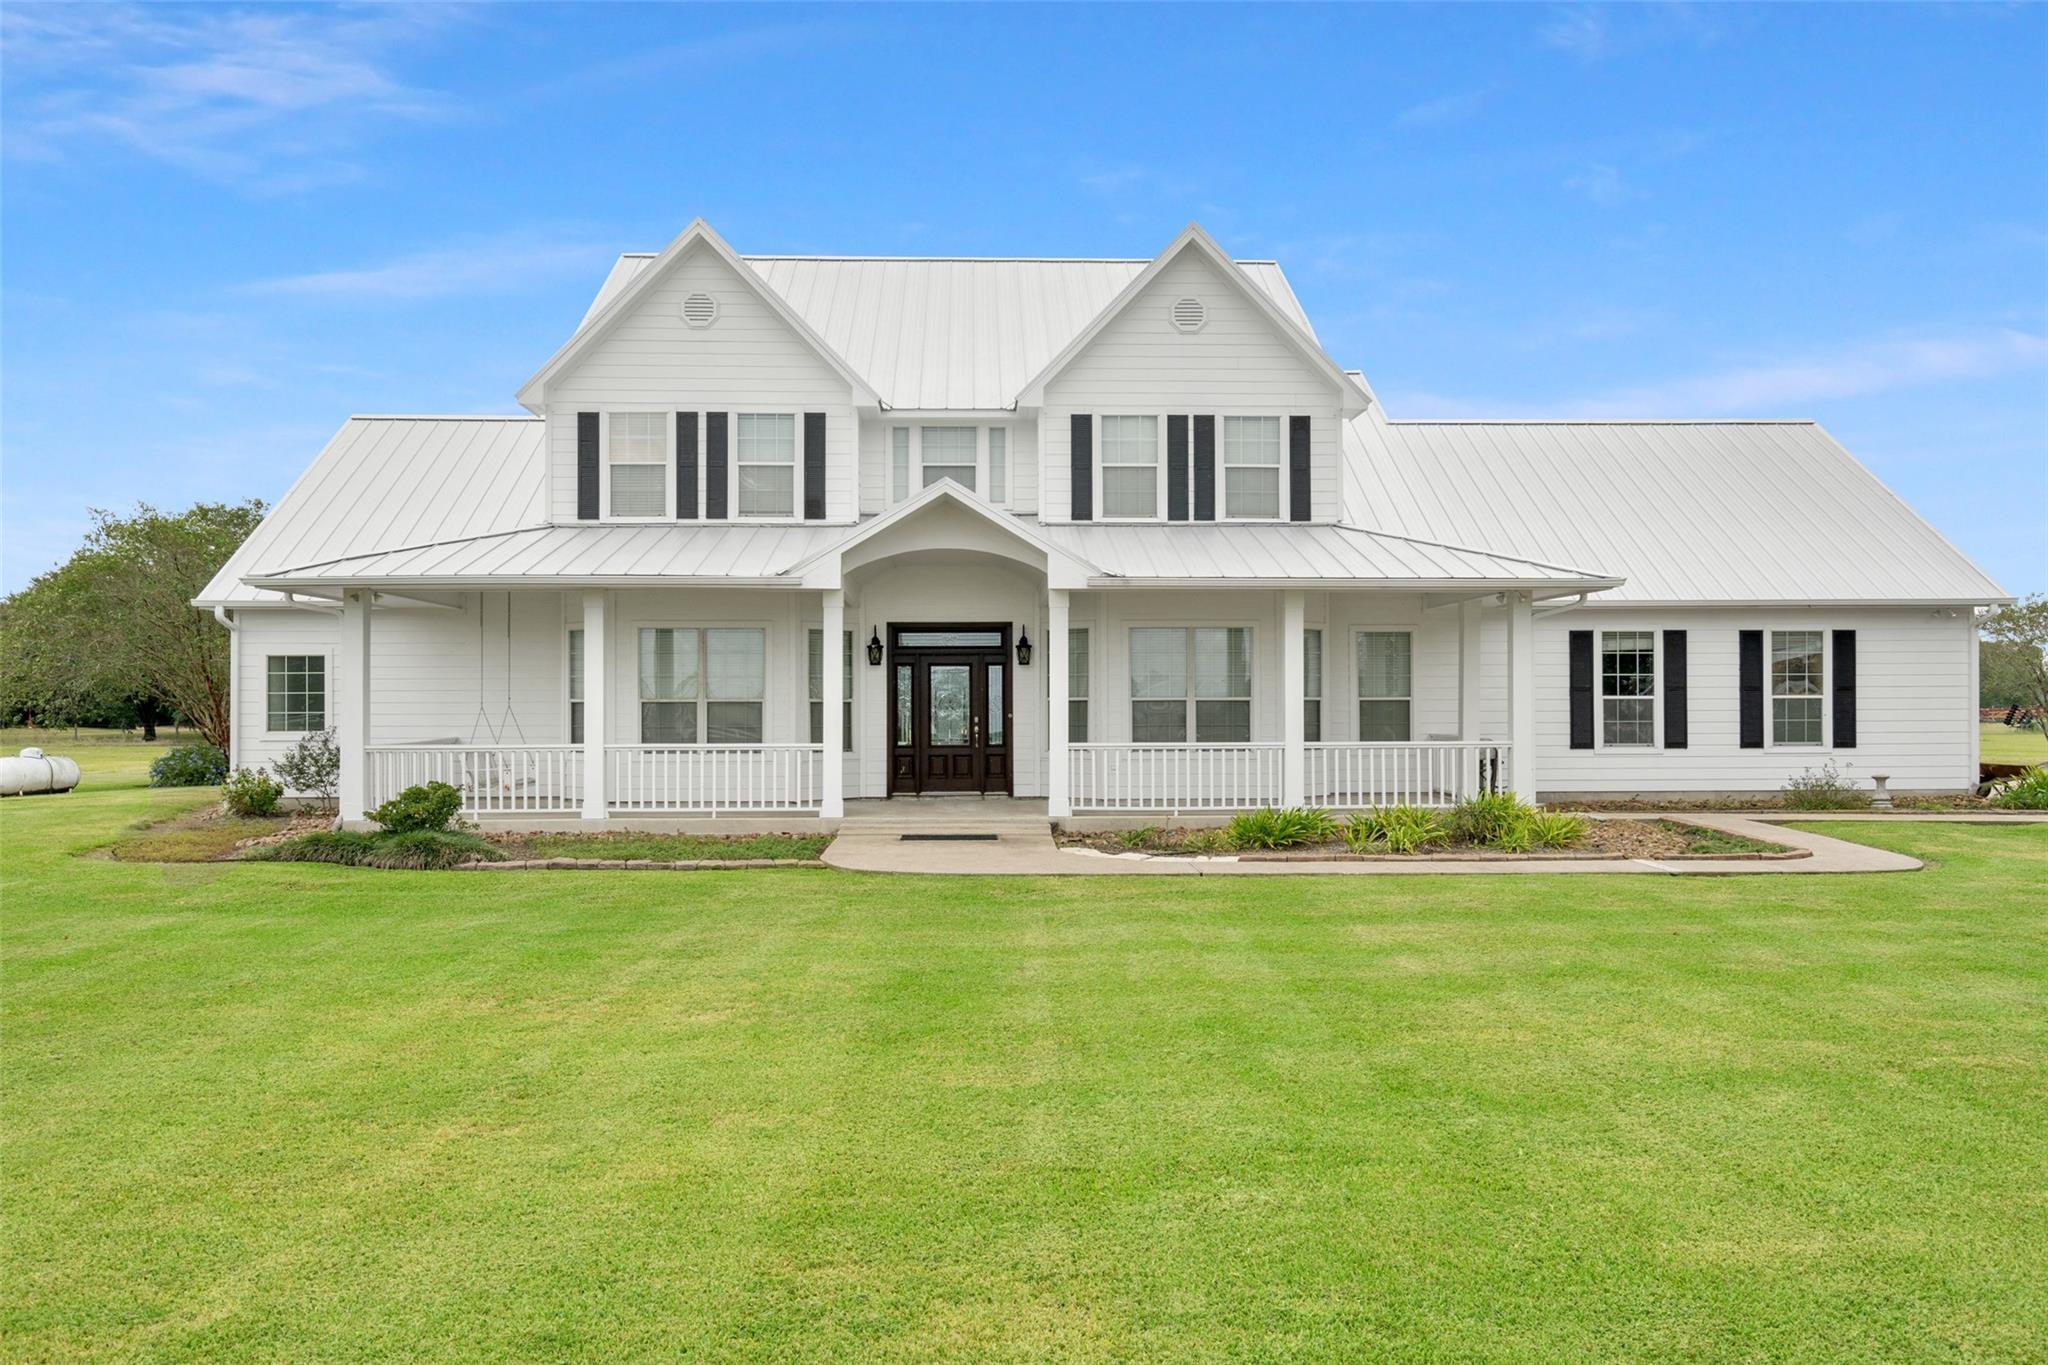 3202 Fm 2936 Property Photo - Anahuac, TX real estate listing